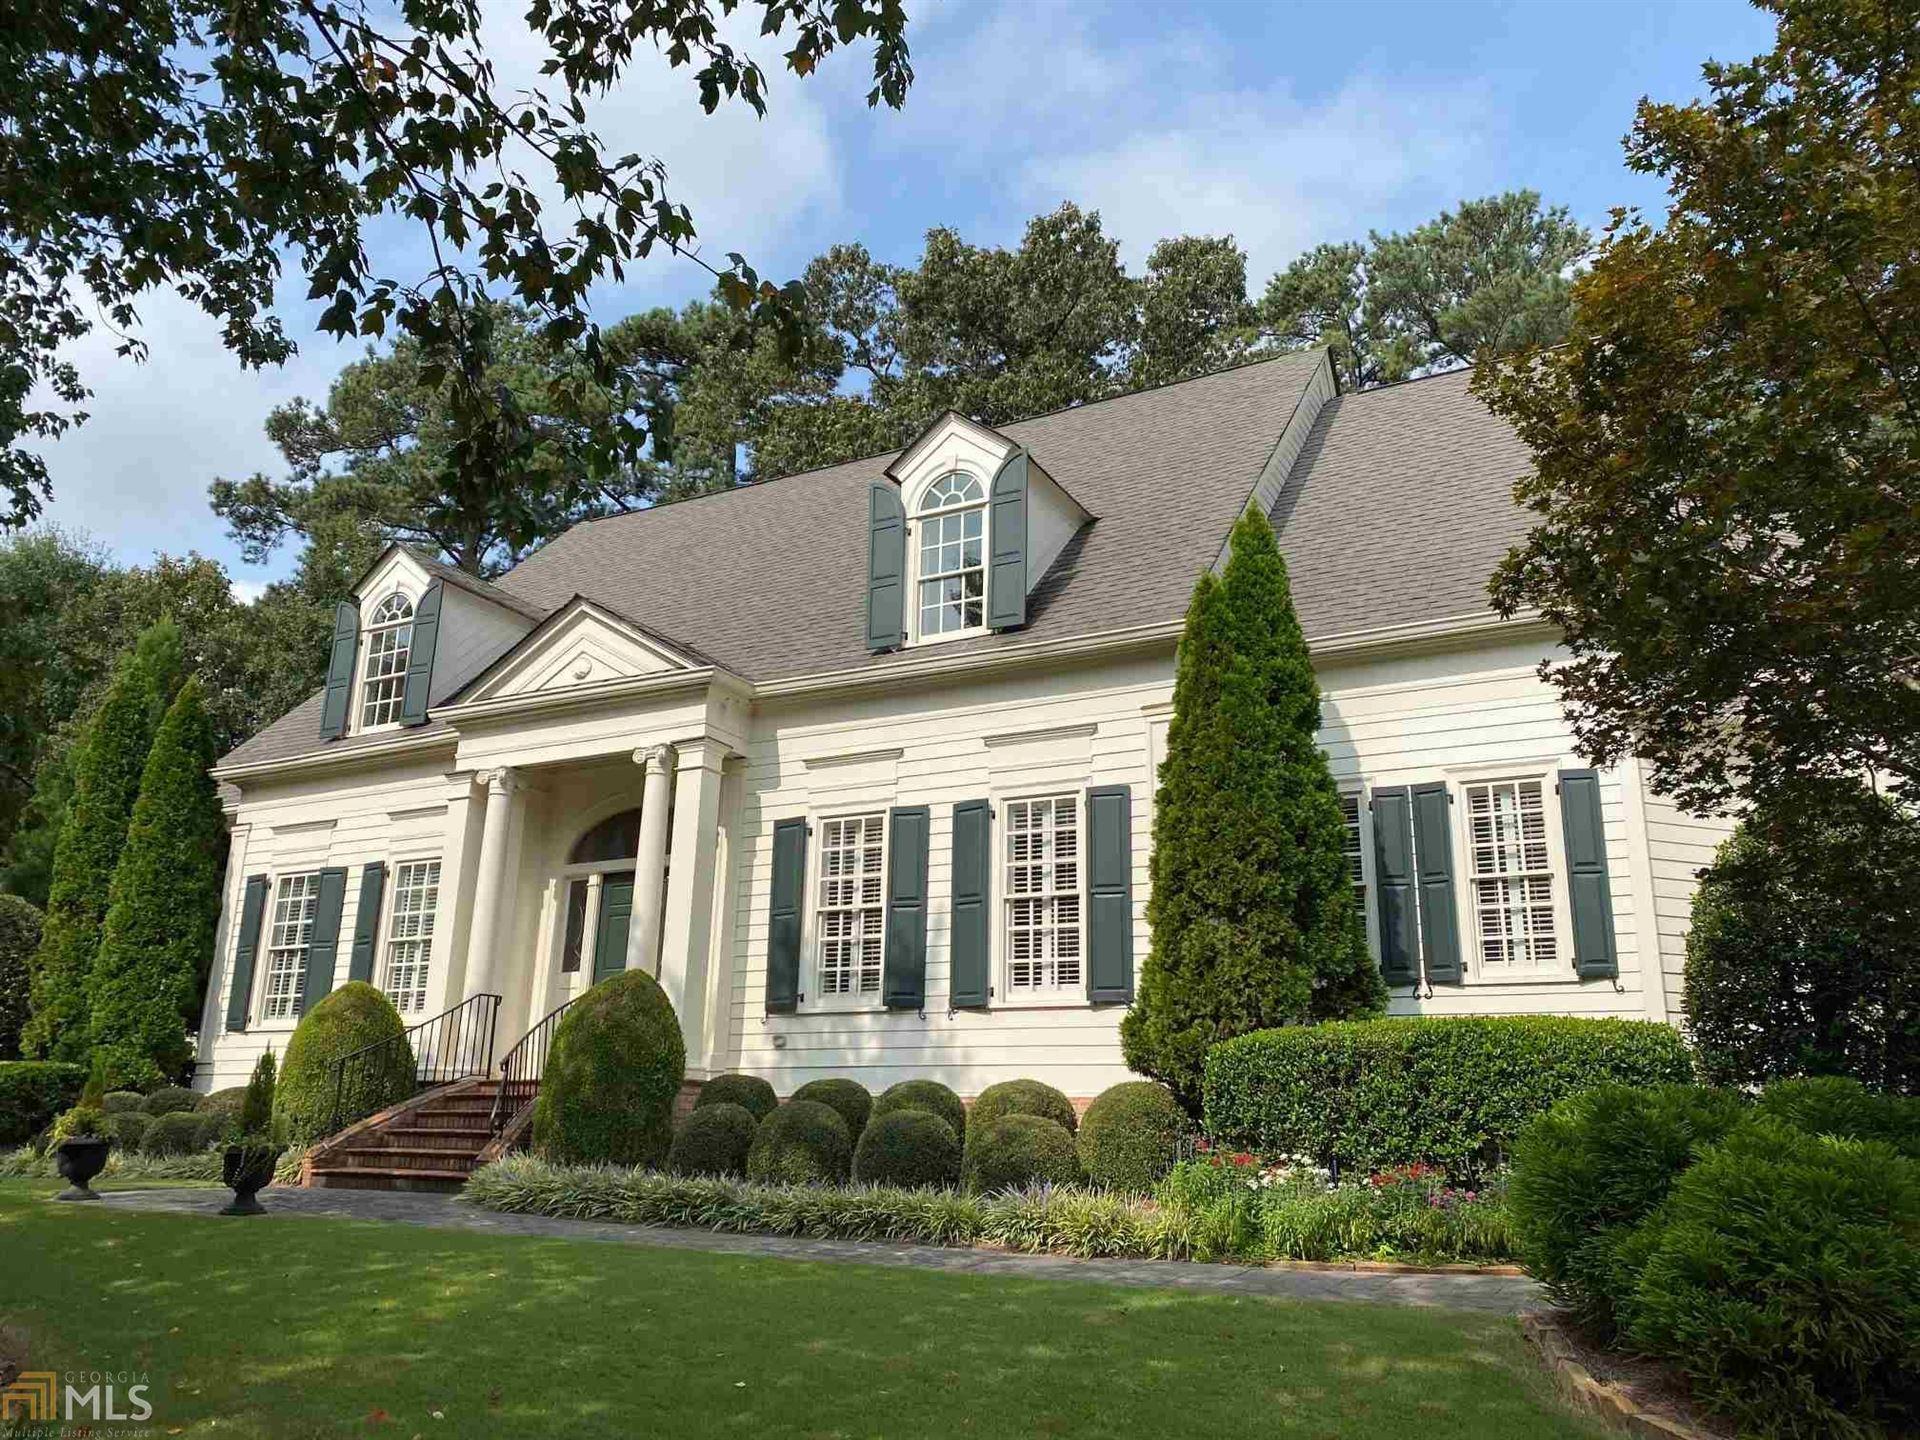 456 Langley Oaks, Marietta, GA 30067 - MLS#: 8876979